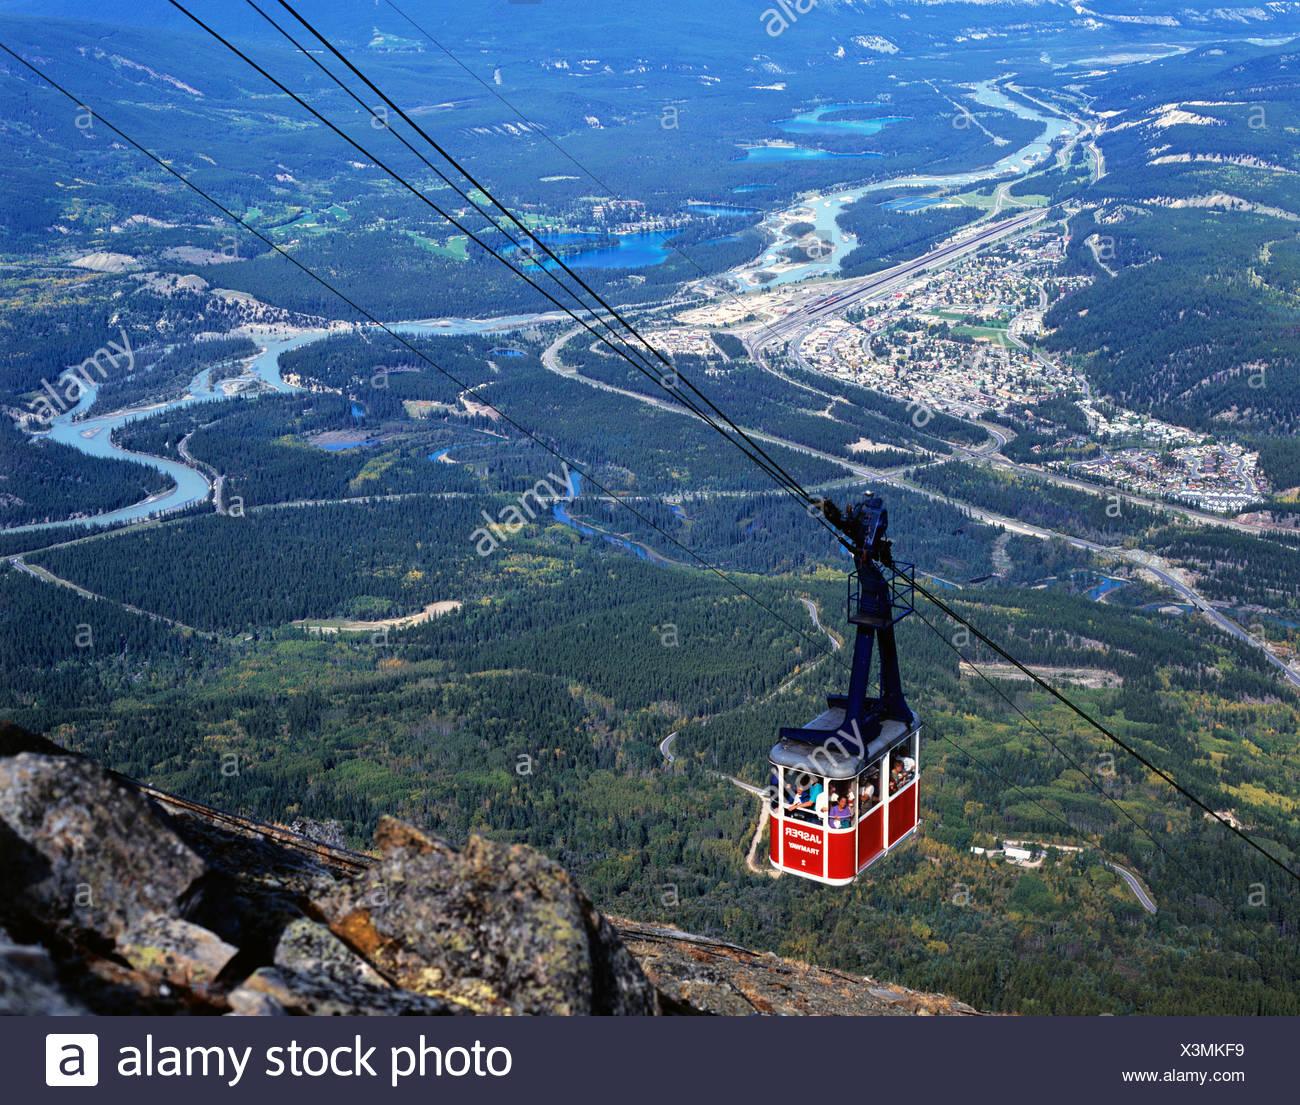 Jasper Tramway, gondola, cablecar, Jasper, Alberta, Canada - Stock Image